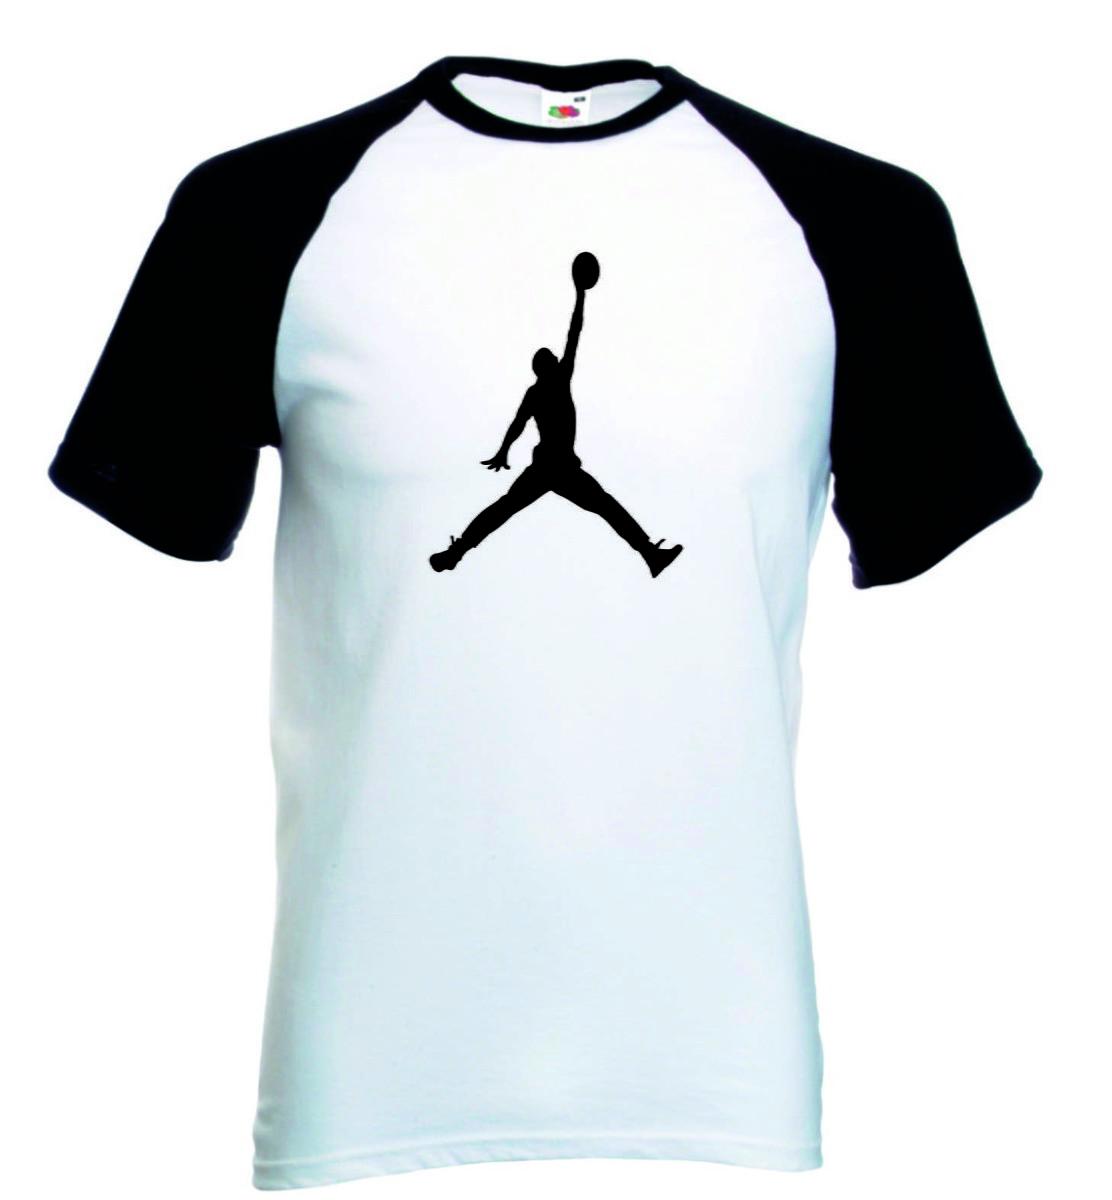 0c3ec7bde Camiseta Raglan Manga Curta Jordan Basquete no Elo7